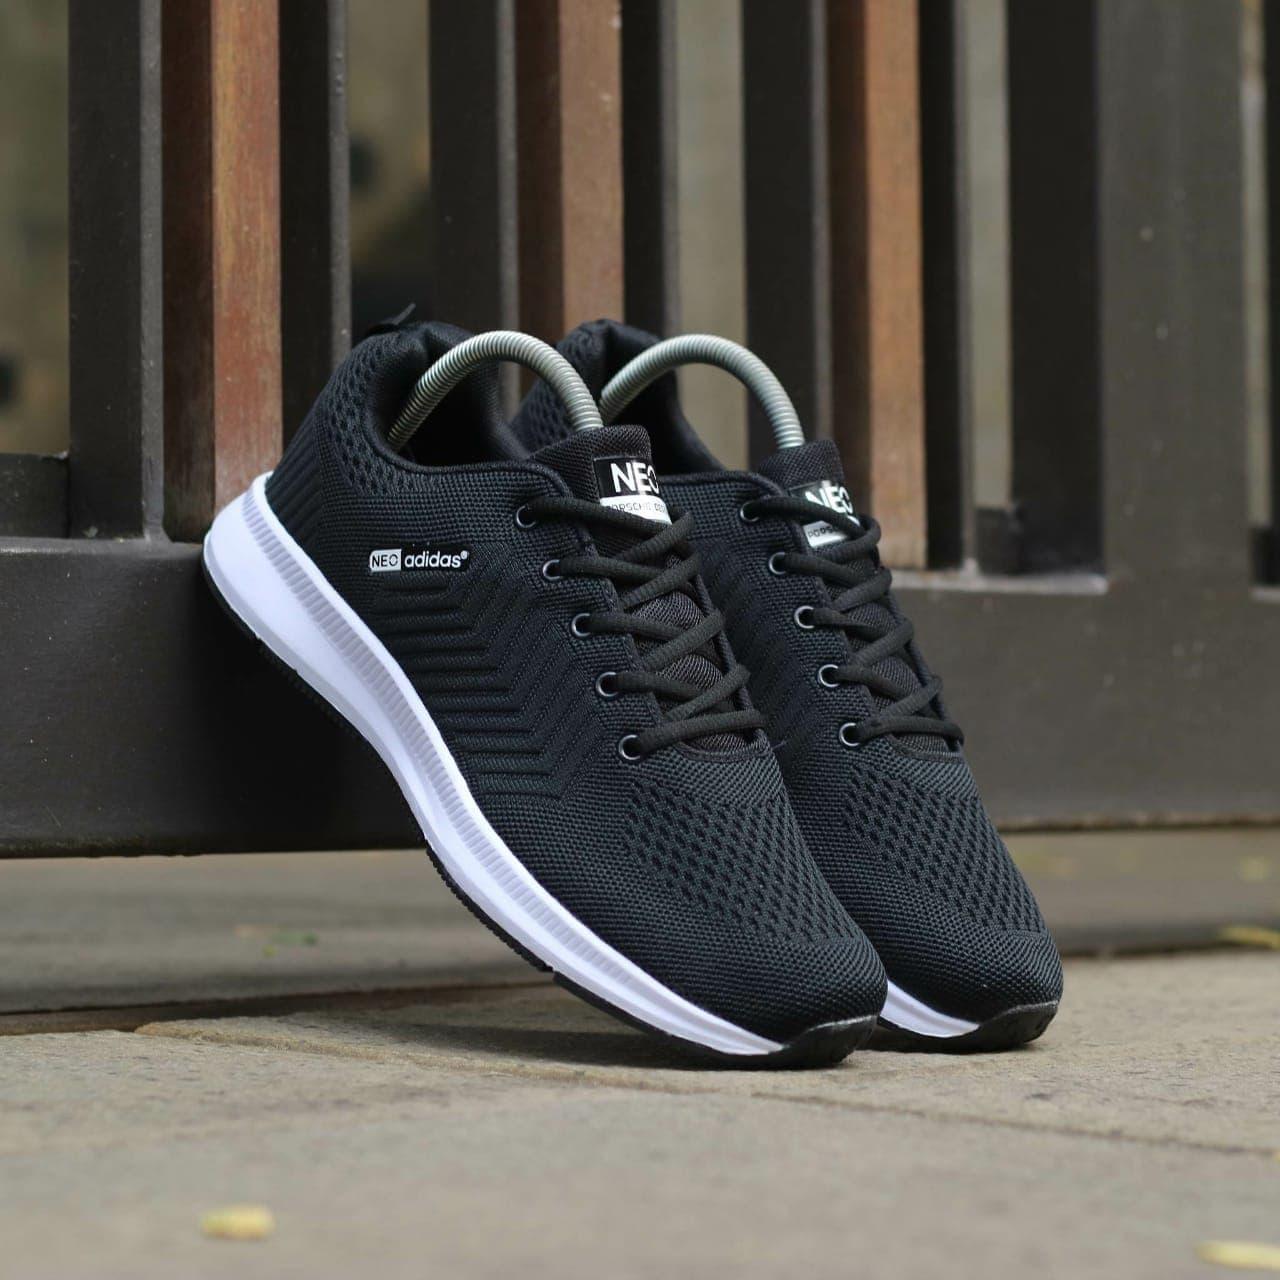 Jual Sepatu Adidas Neo Import. Sepatu Pria. Sepatu Sport. Sneakers ... 48bdf334b7